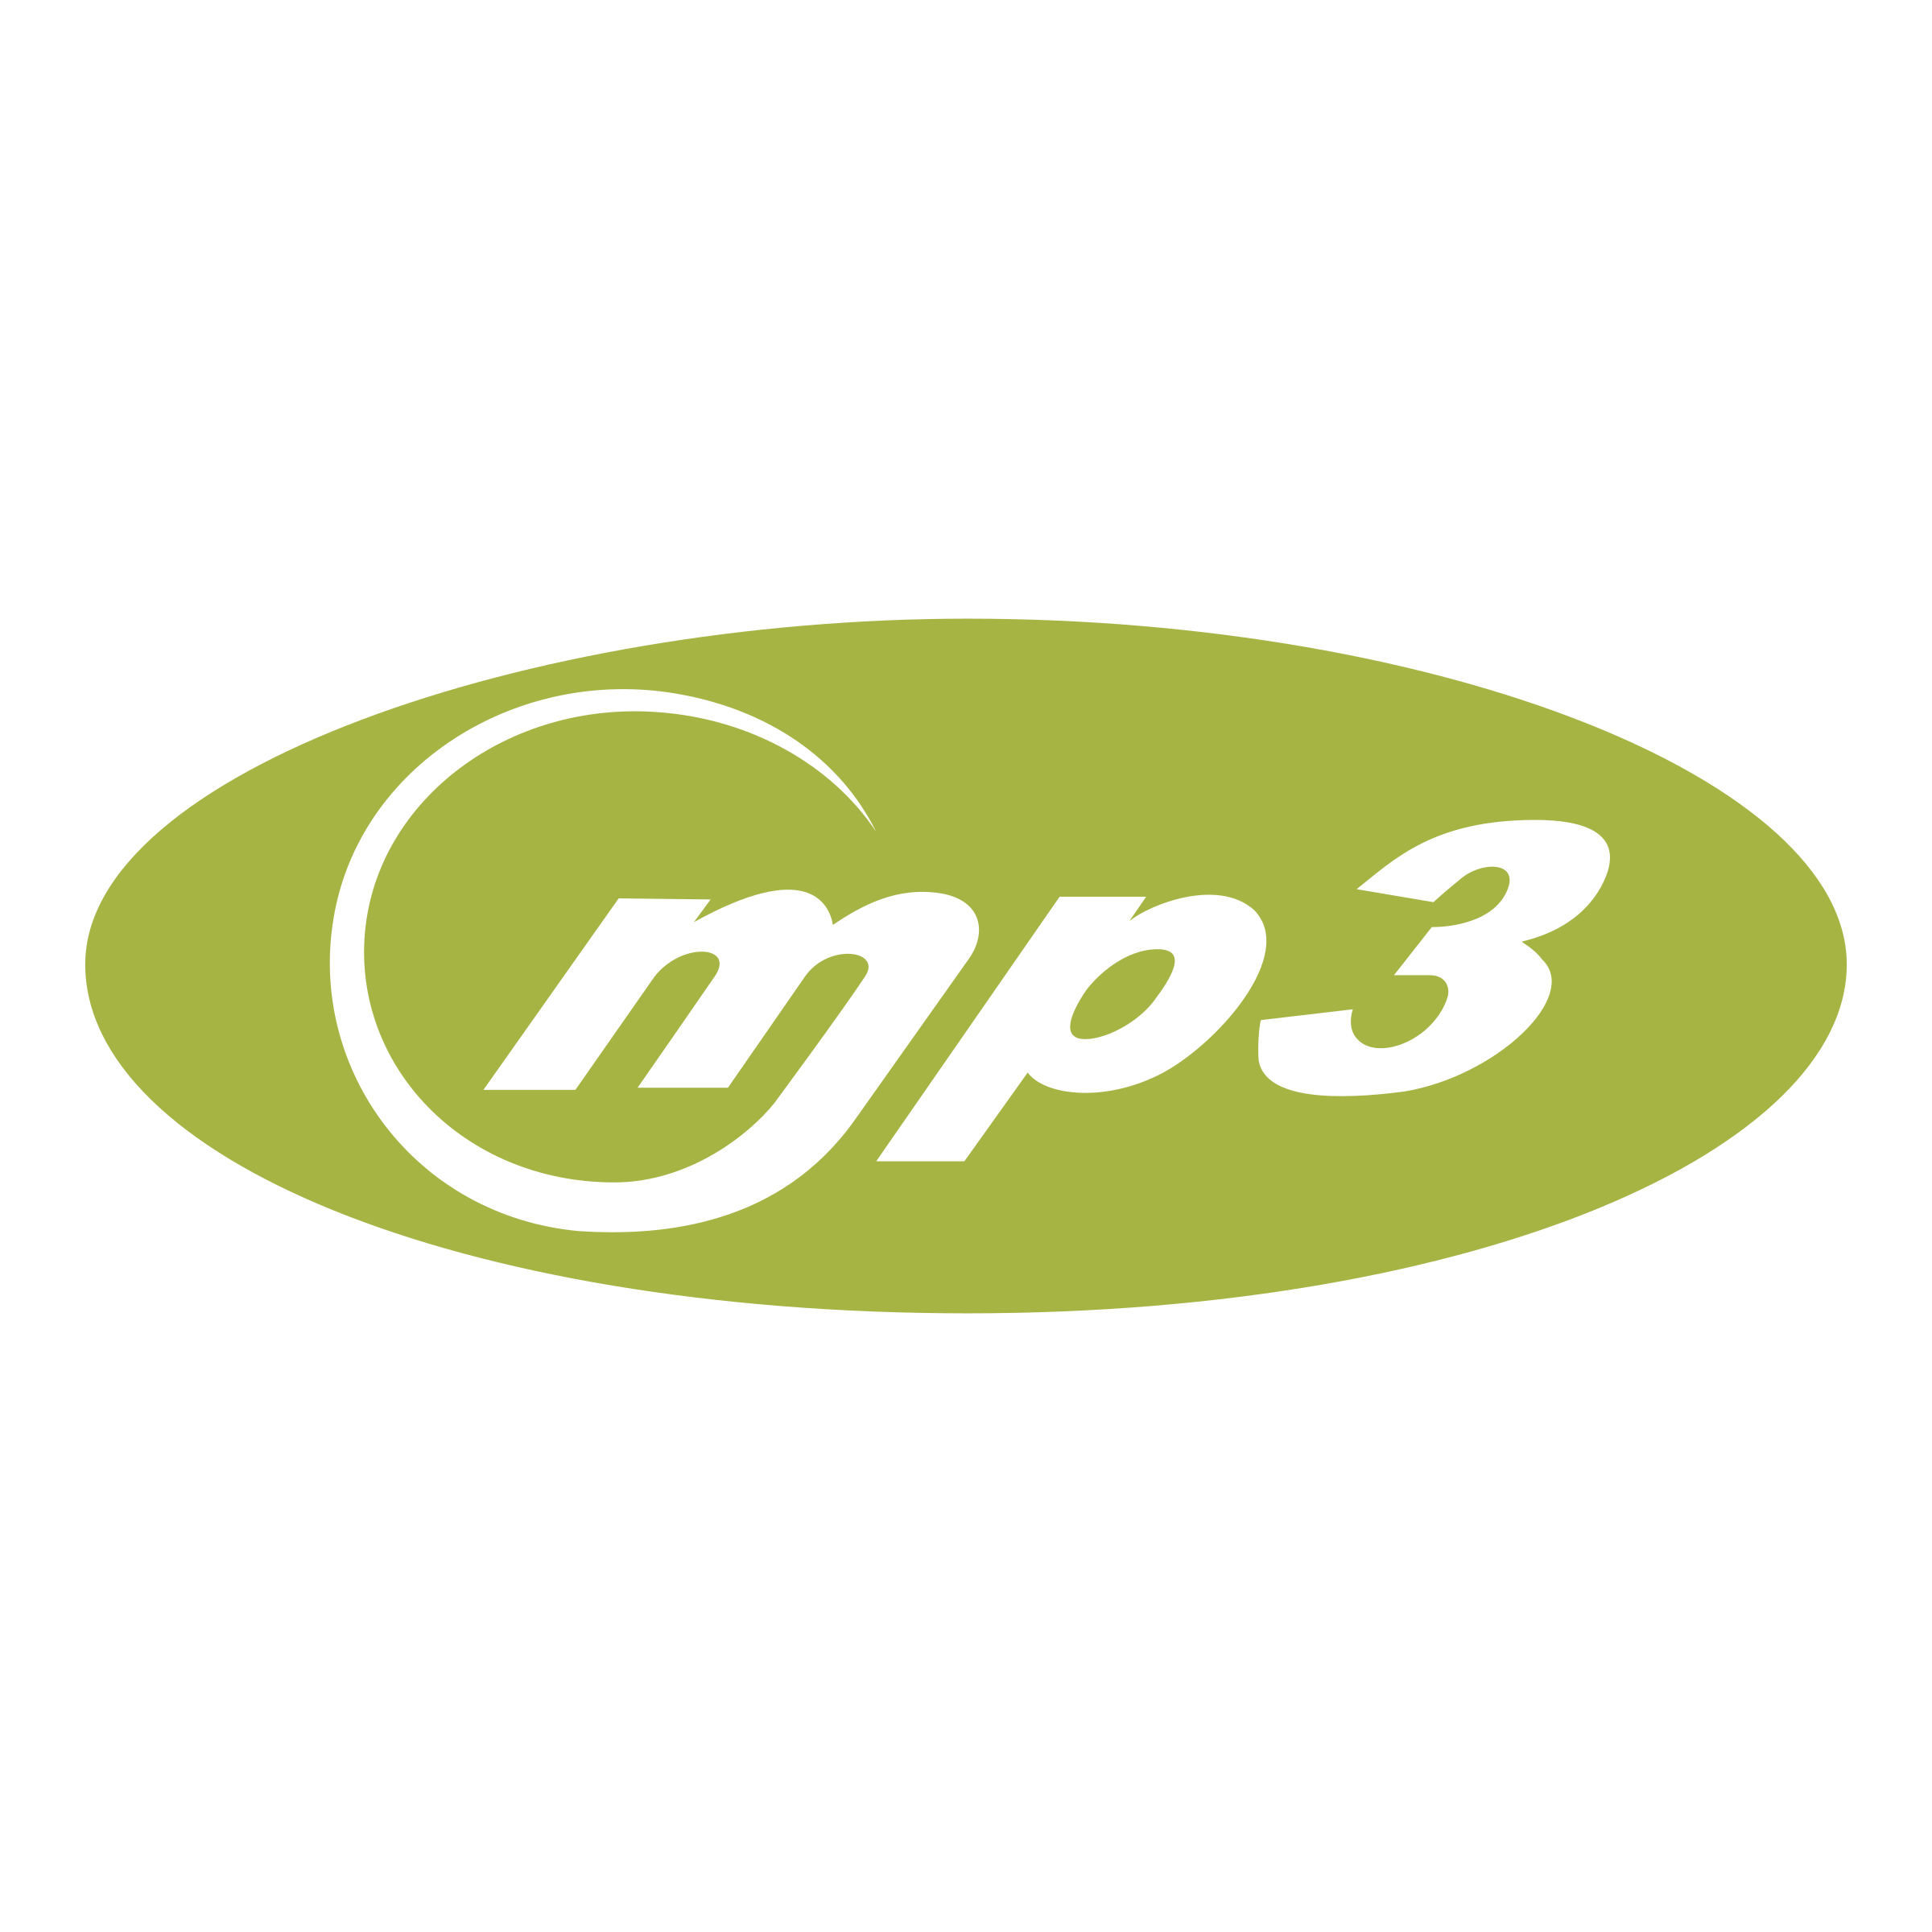 MP3 Logo PNG Transparent & SVG Vector.